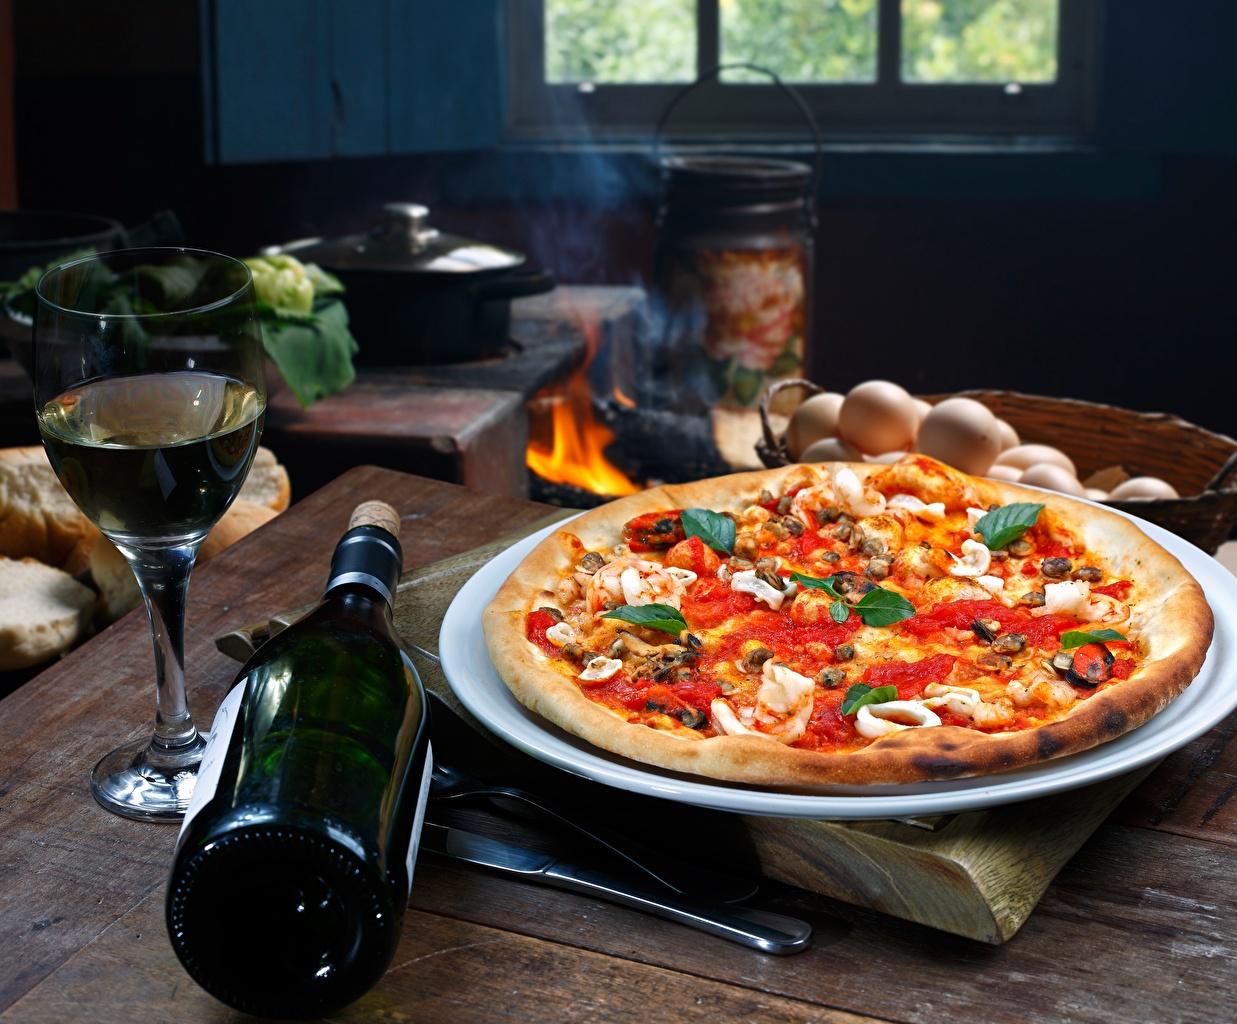 Фотографии Пицца Стол бутылки Продукты питания Еда Пища столы стола Бутылка